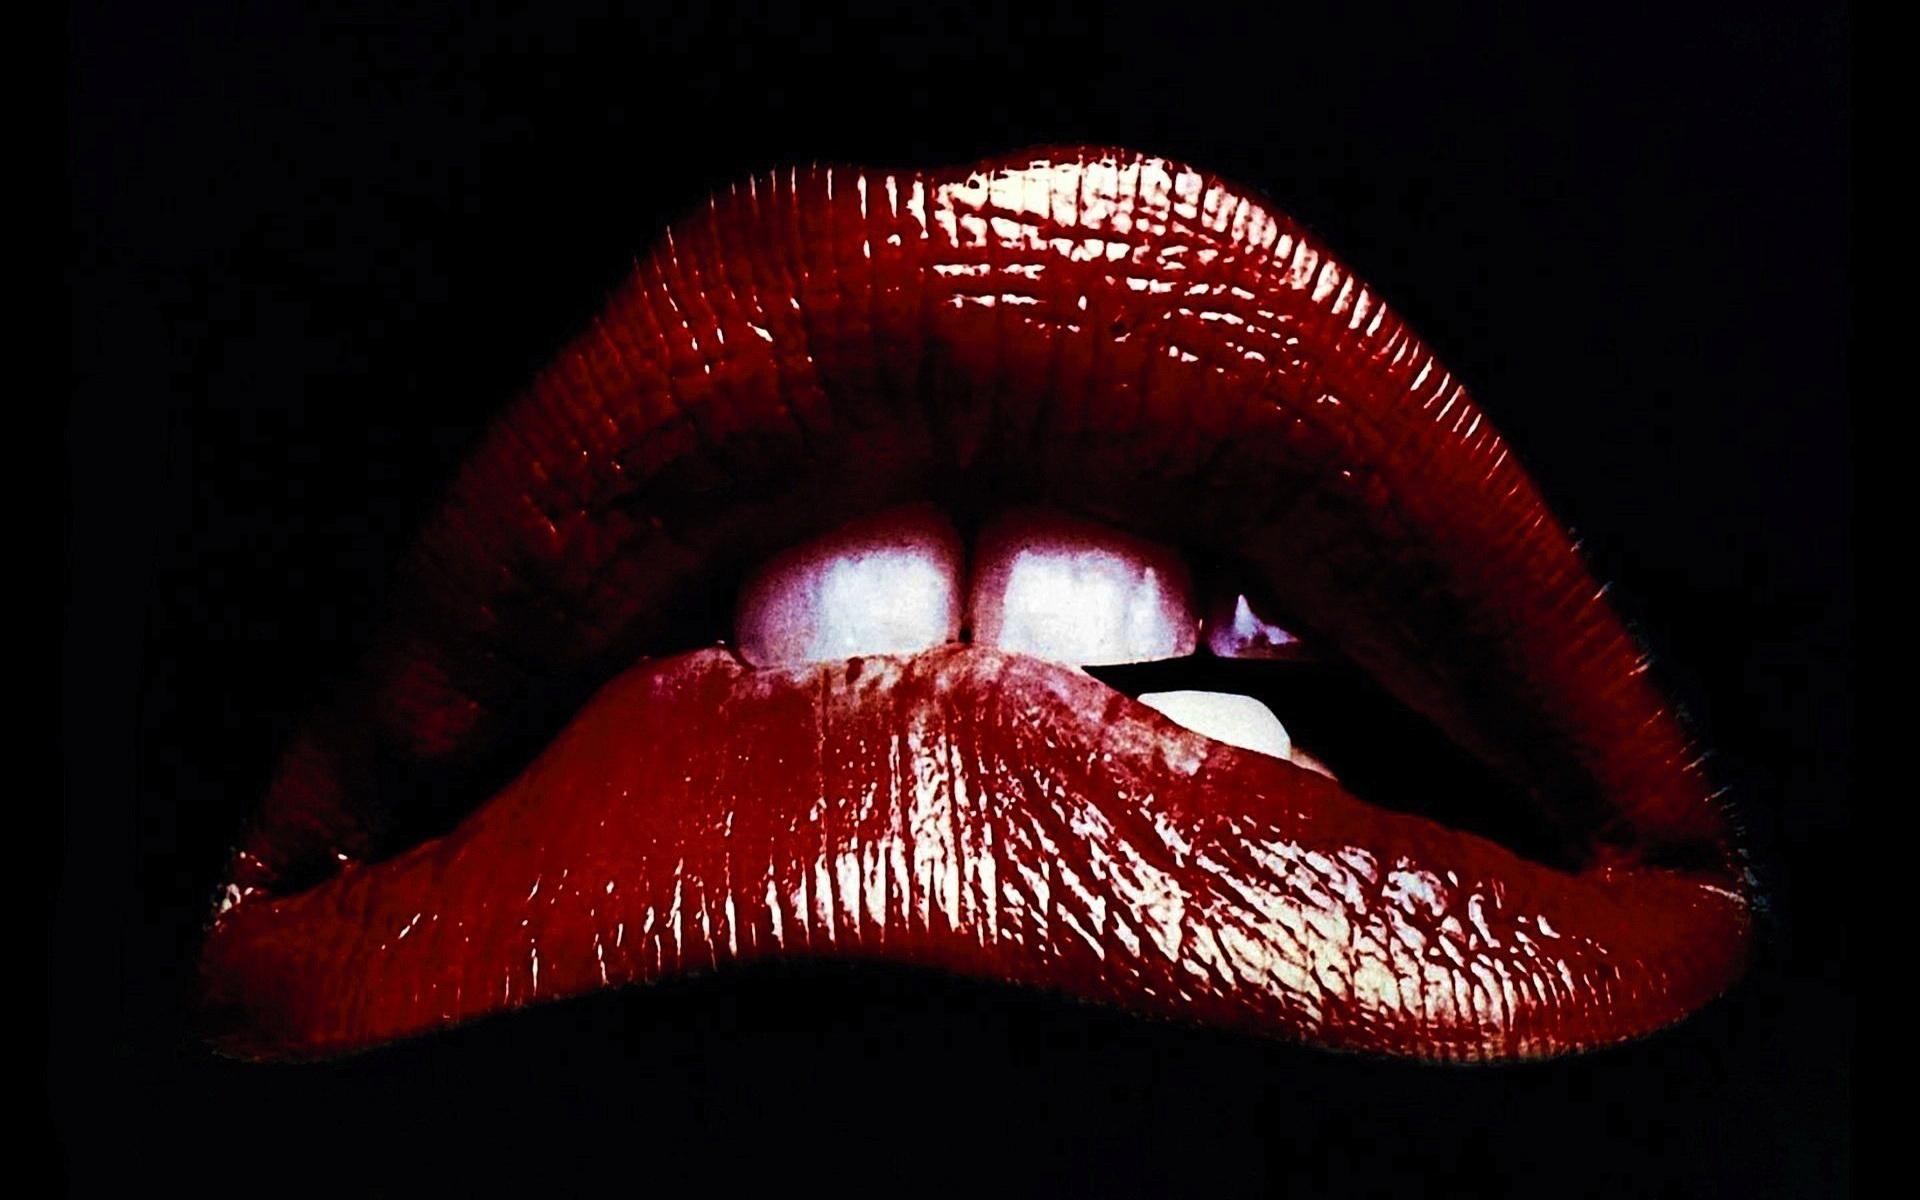 lips wallpaper hd desktop - photo #21